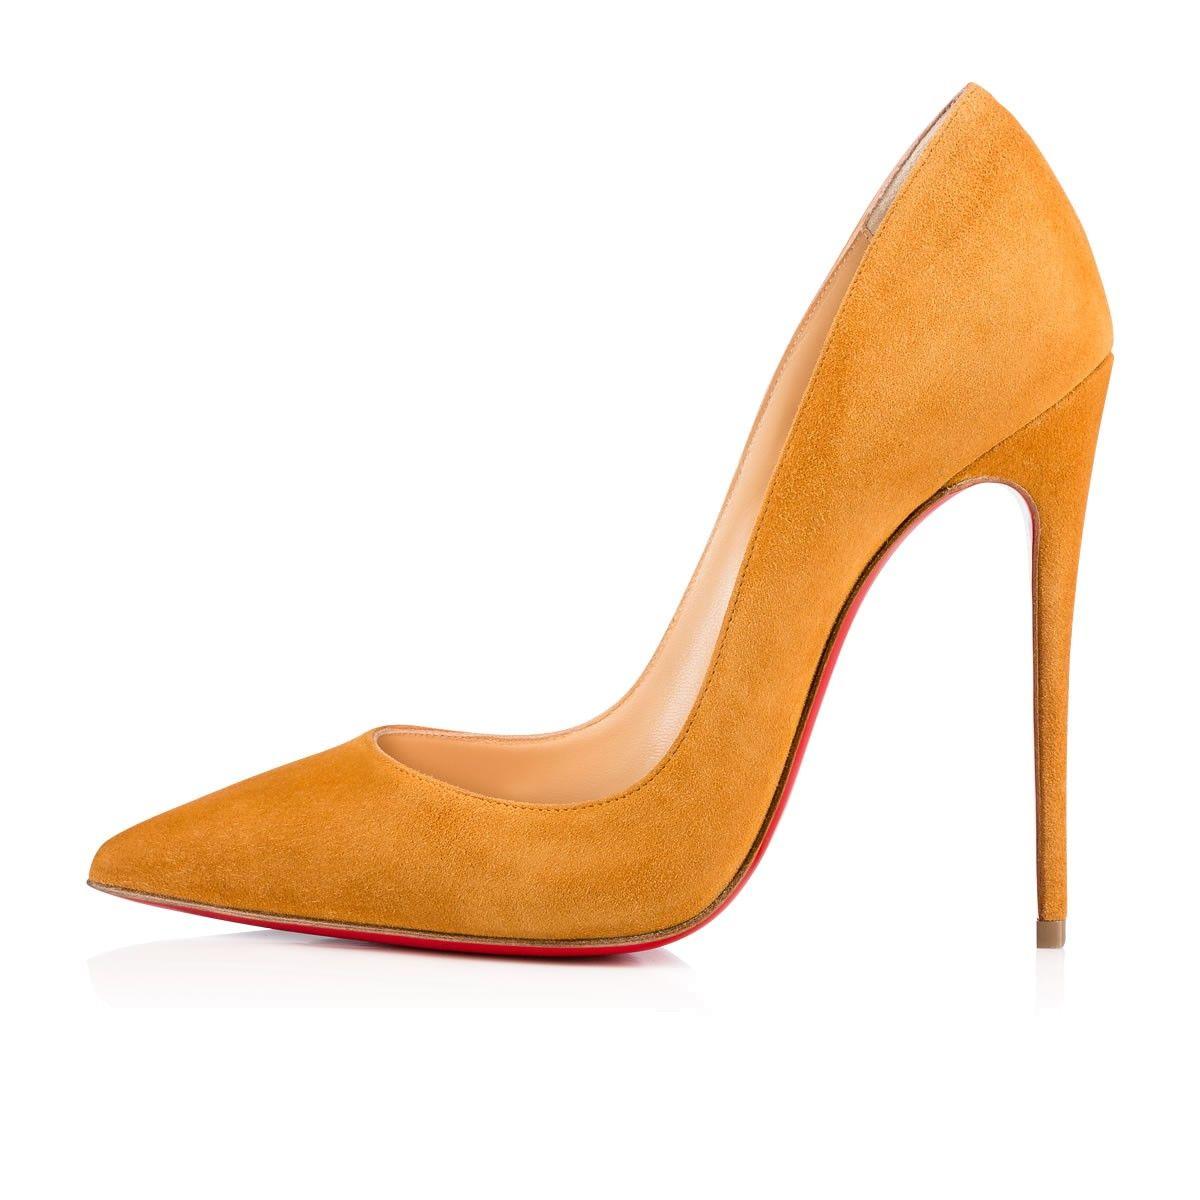 74b9522343d1 Women Shoes - So Kate Veau Velours - Christian Louboutin